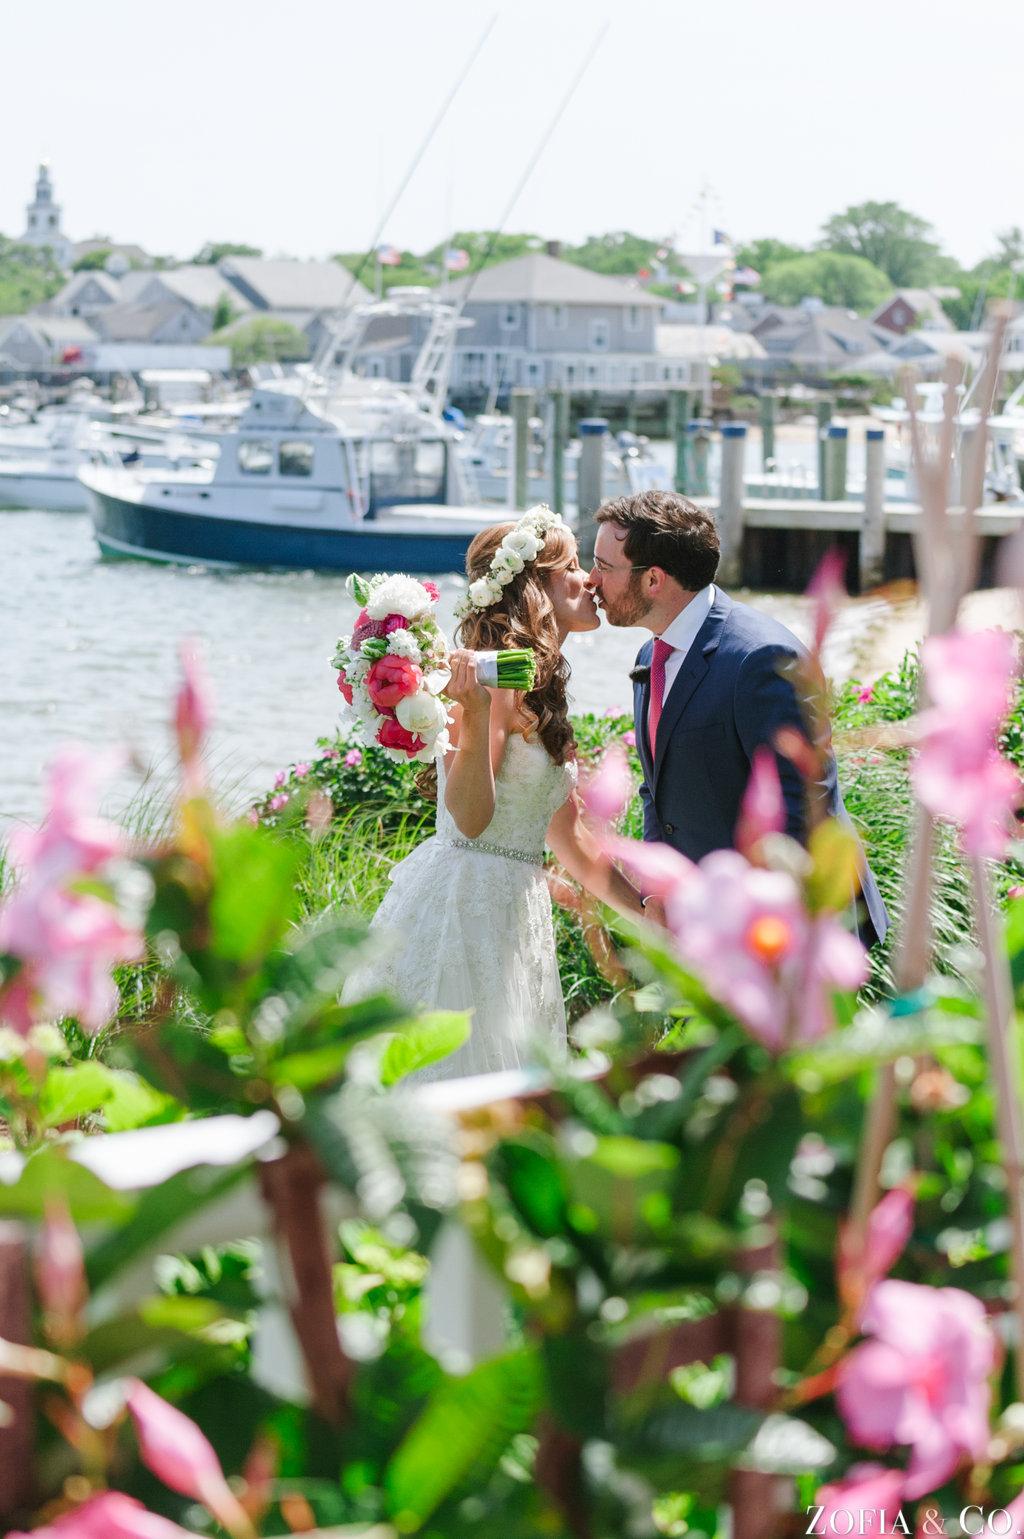 Ceci_New_York_Style_Luxury_Custom_Summer_Wedding_CeciBride_Nautical_Blue_Gold_Letterpress_Foil_33.jpg